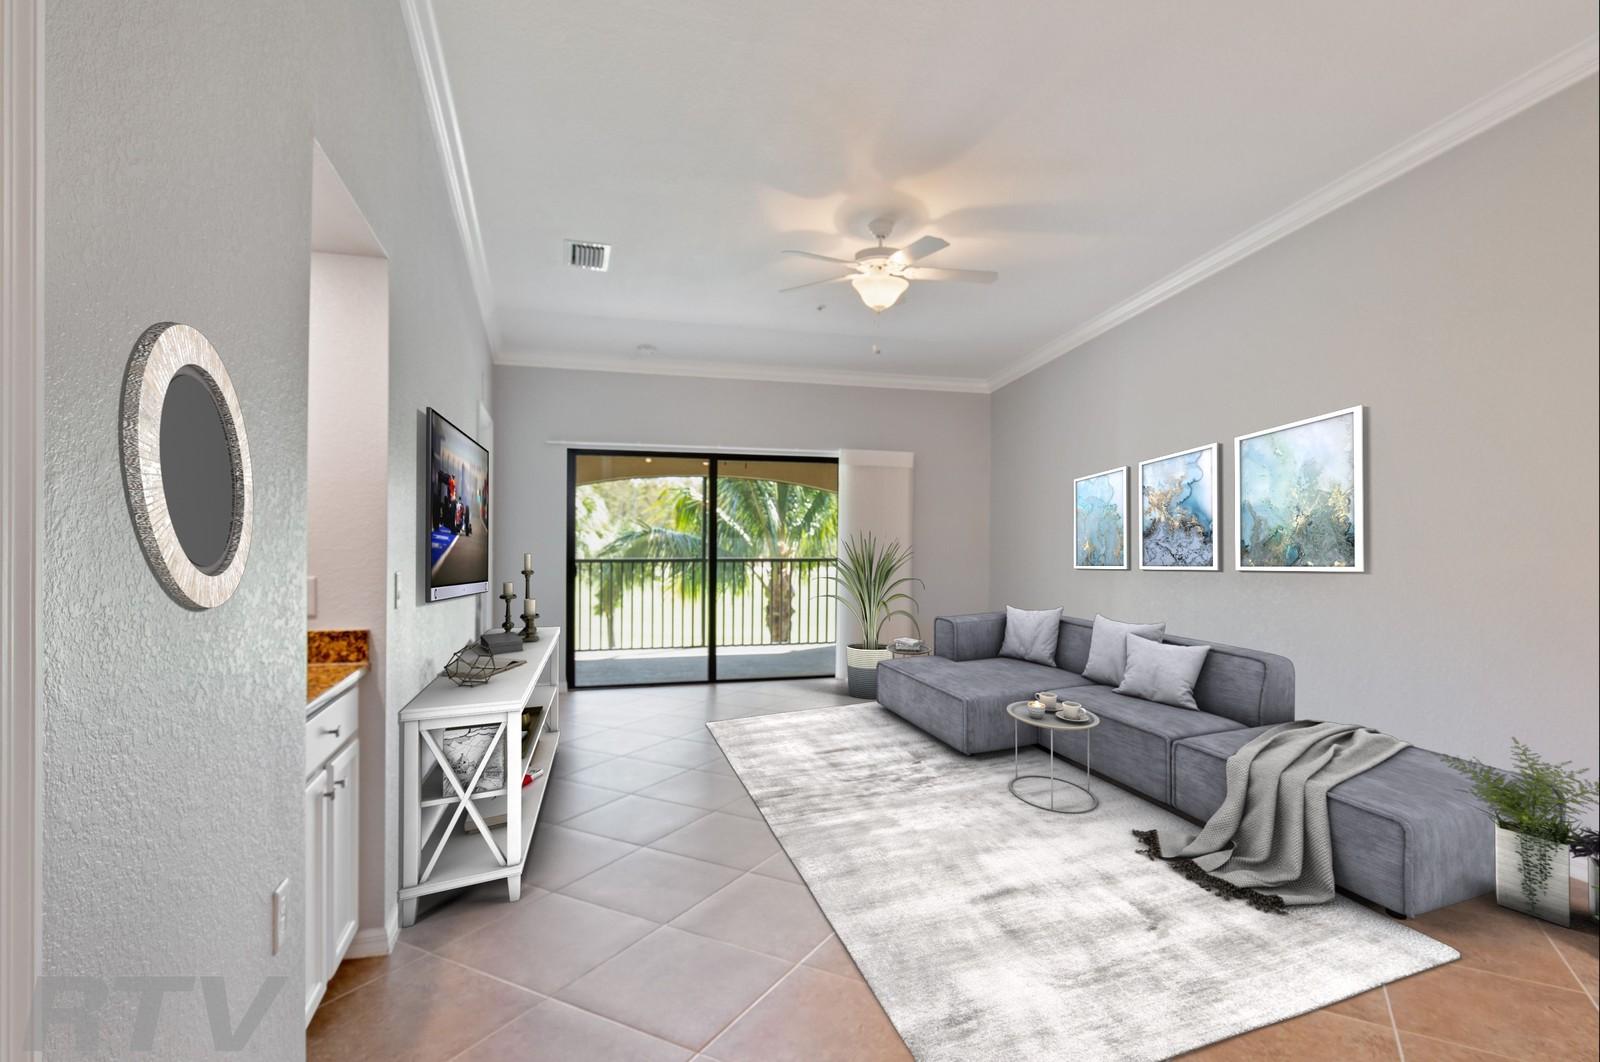 Real Estate Photography - 17980 Bonita National Blvd #1922, Bonita Springs, FL, 34135 - Living Room (Virtually Staged)